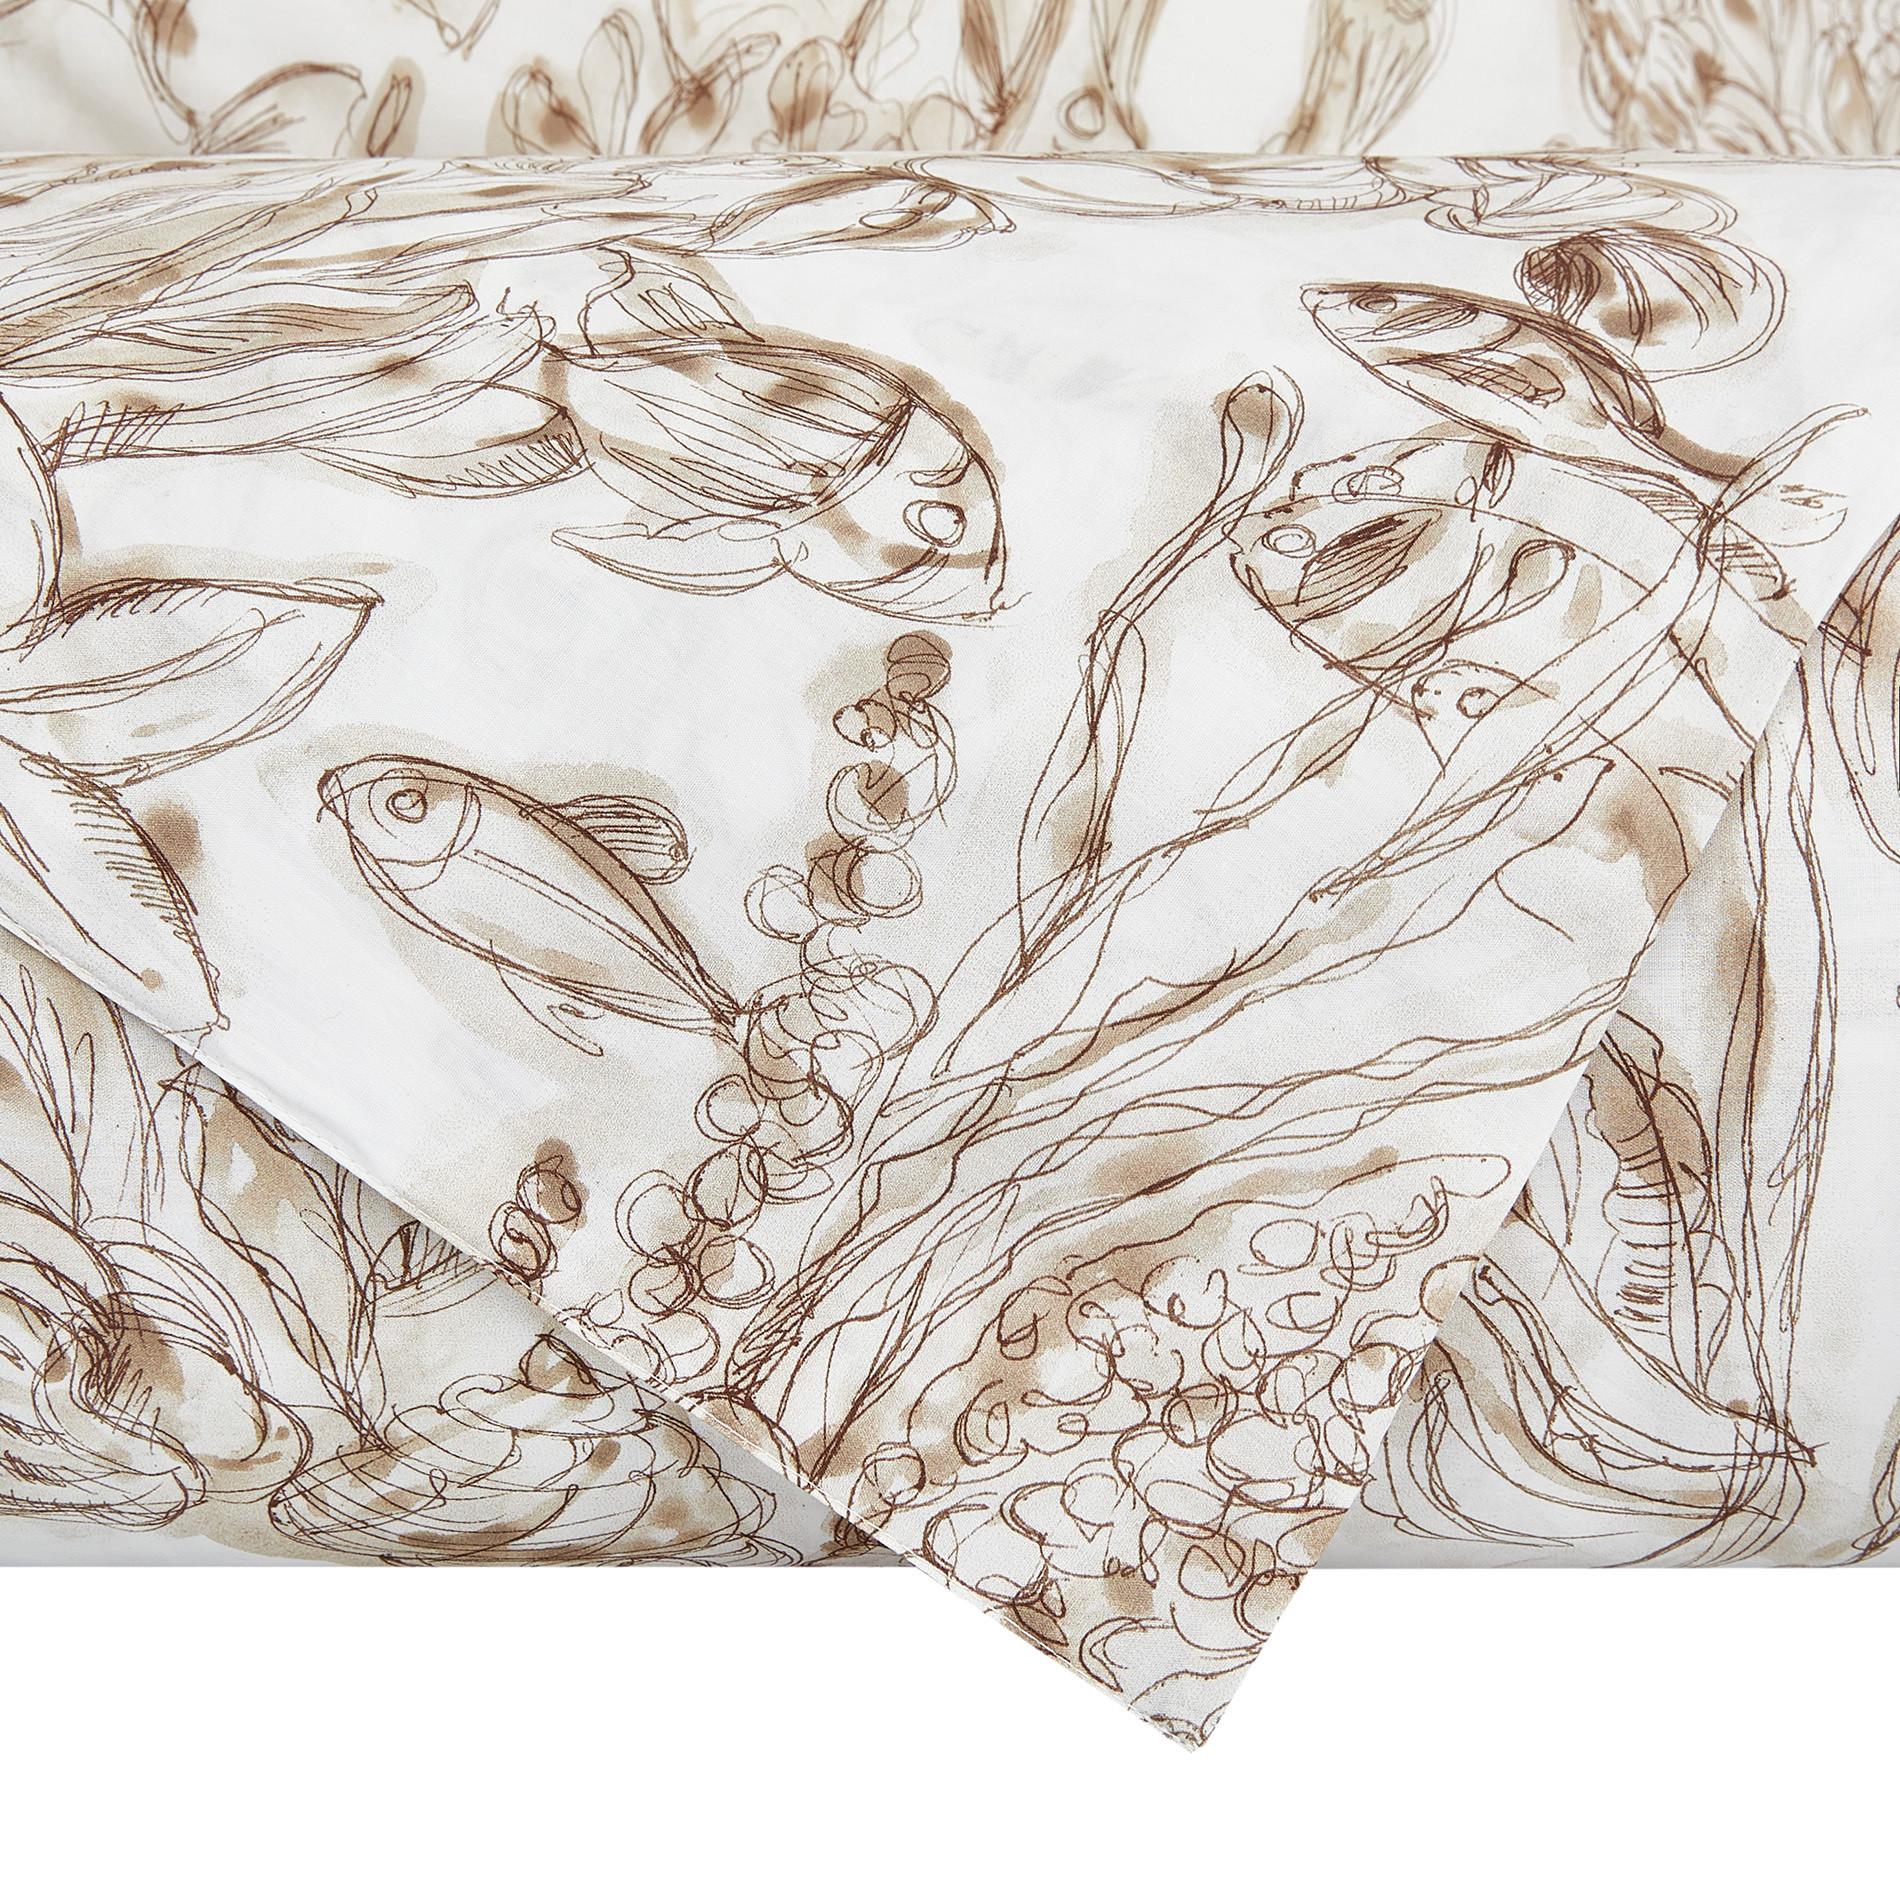 Copripiumino cotone biologico fantasia marina, Beige, large image number 2